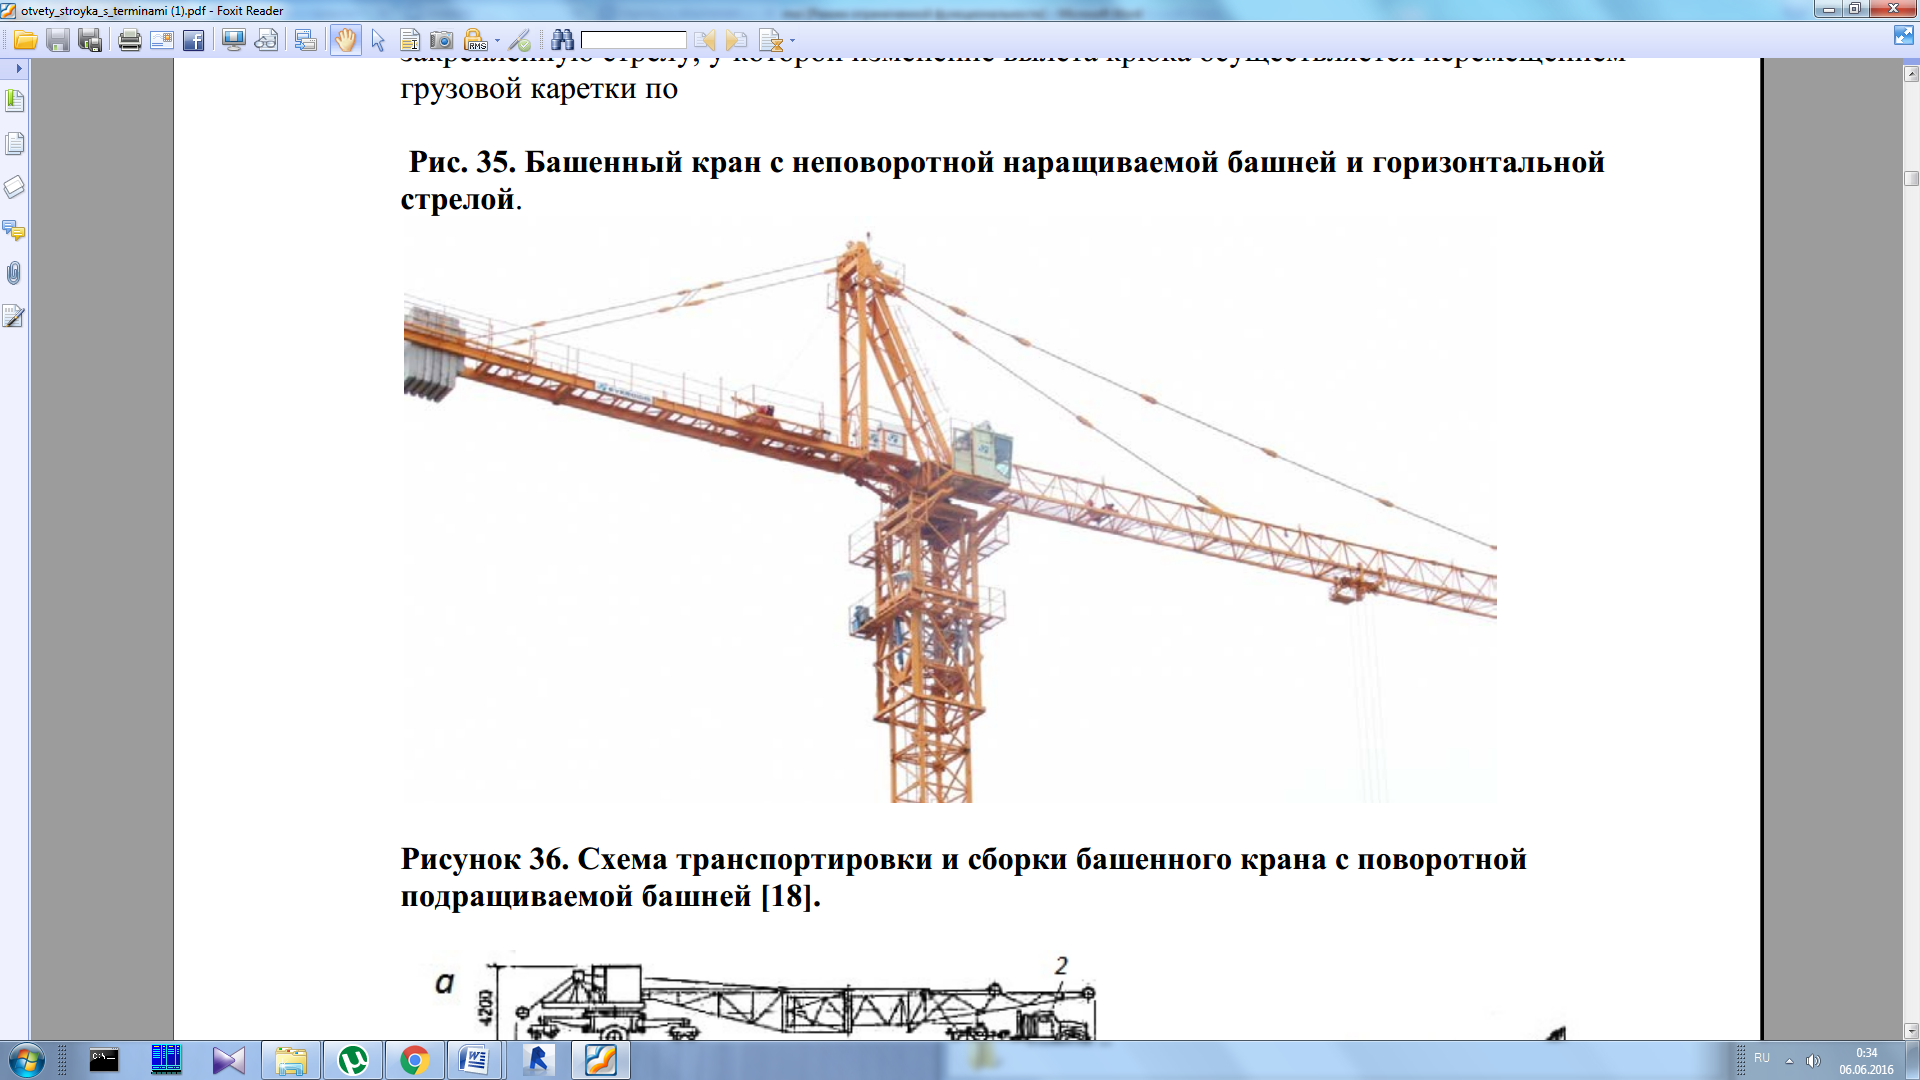 Схема наращивания башенного крана